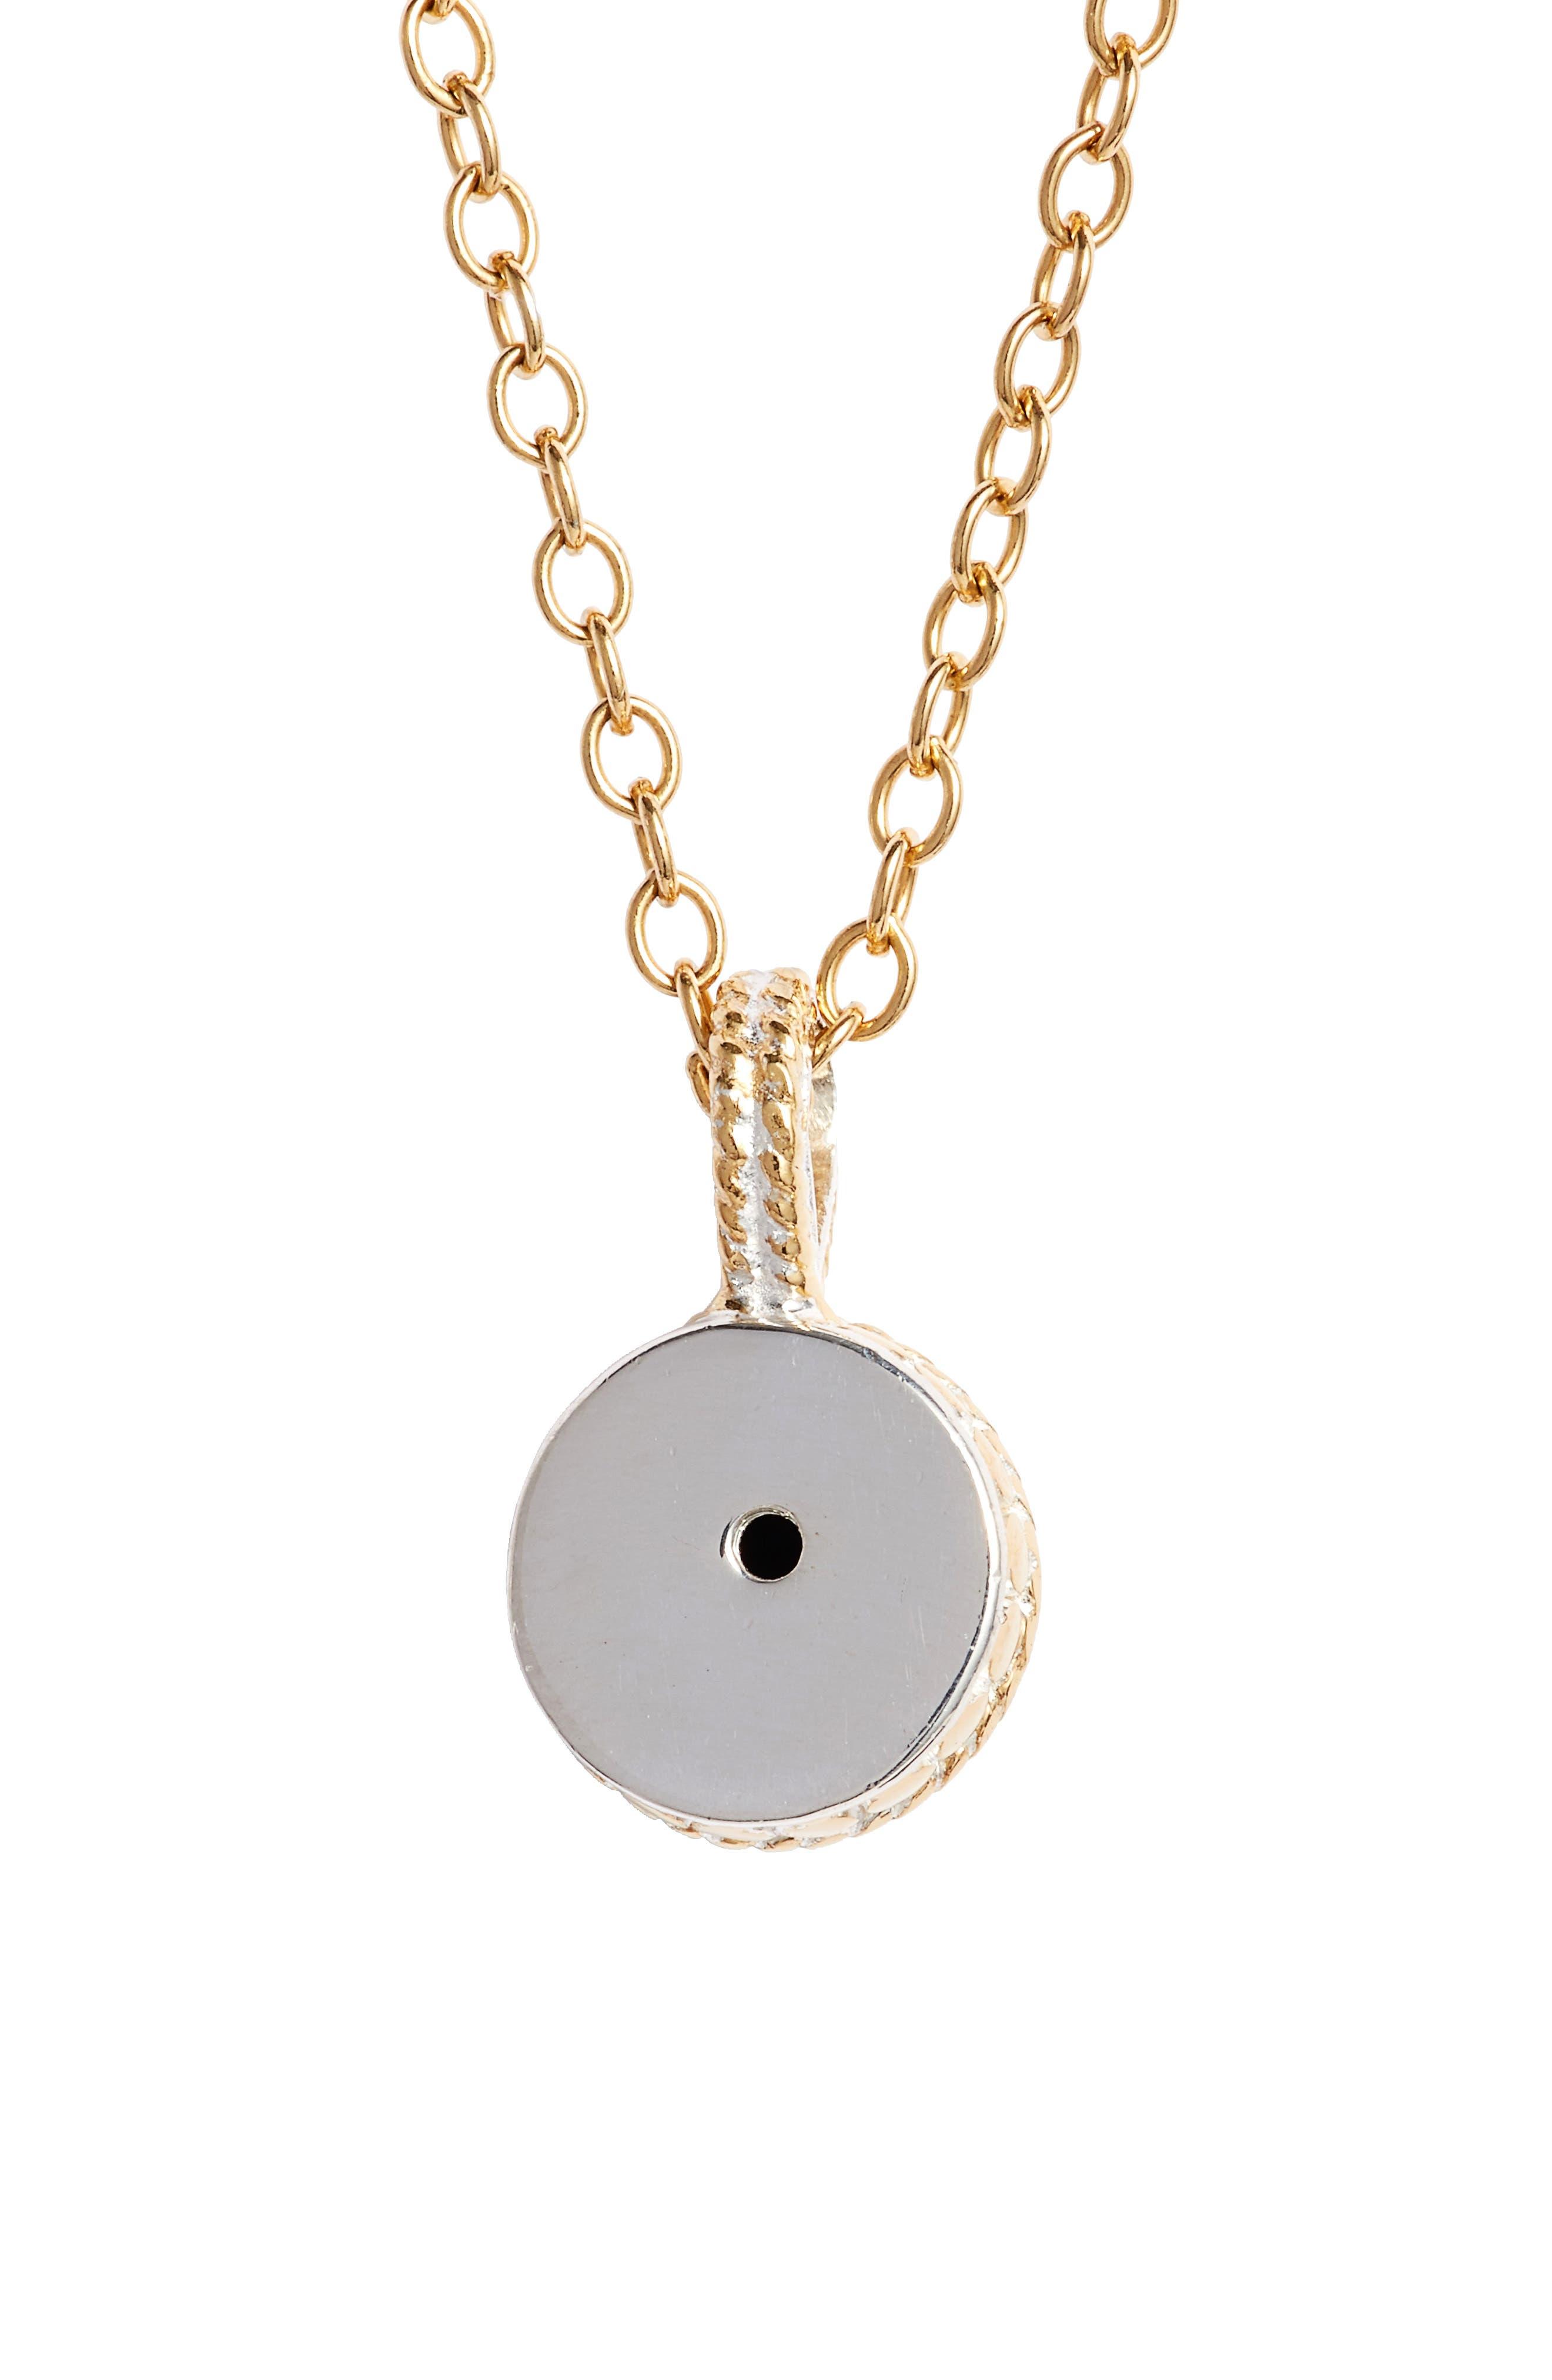 Semiprecious Stone Round Drop Pendant Necklace,                             Alternate thumbnail 4, color,                             Gold/ Black Onyx